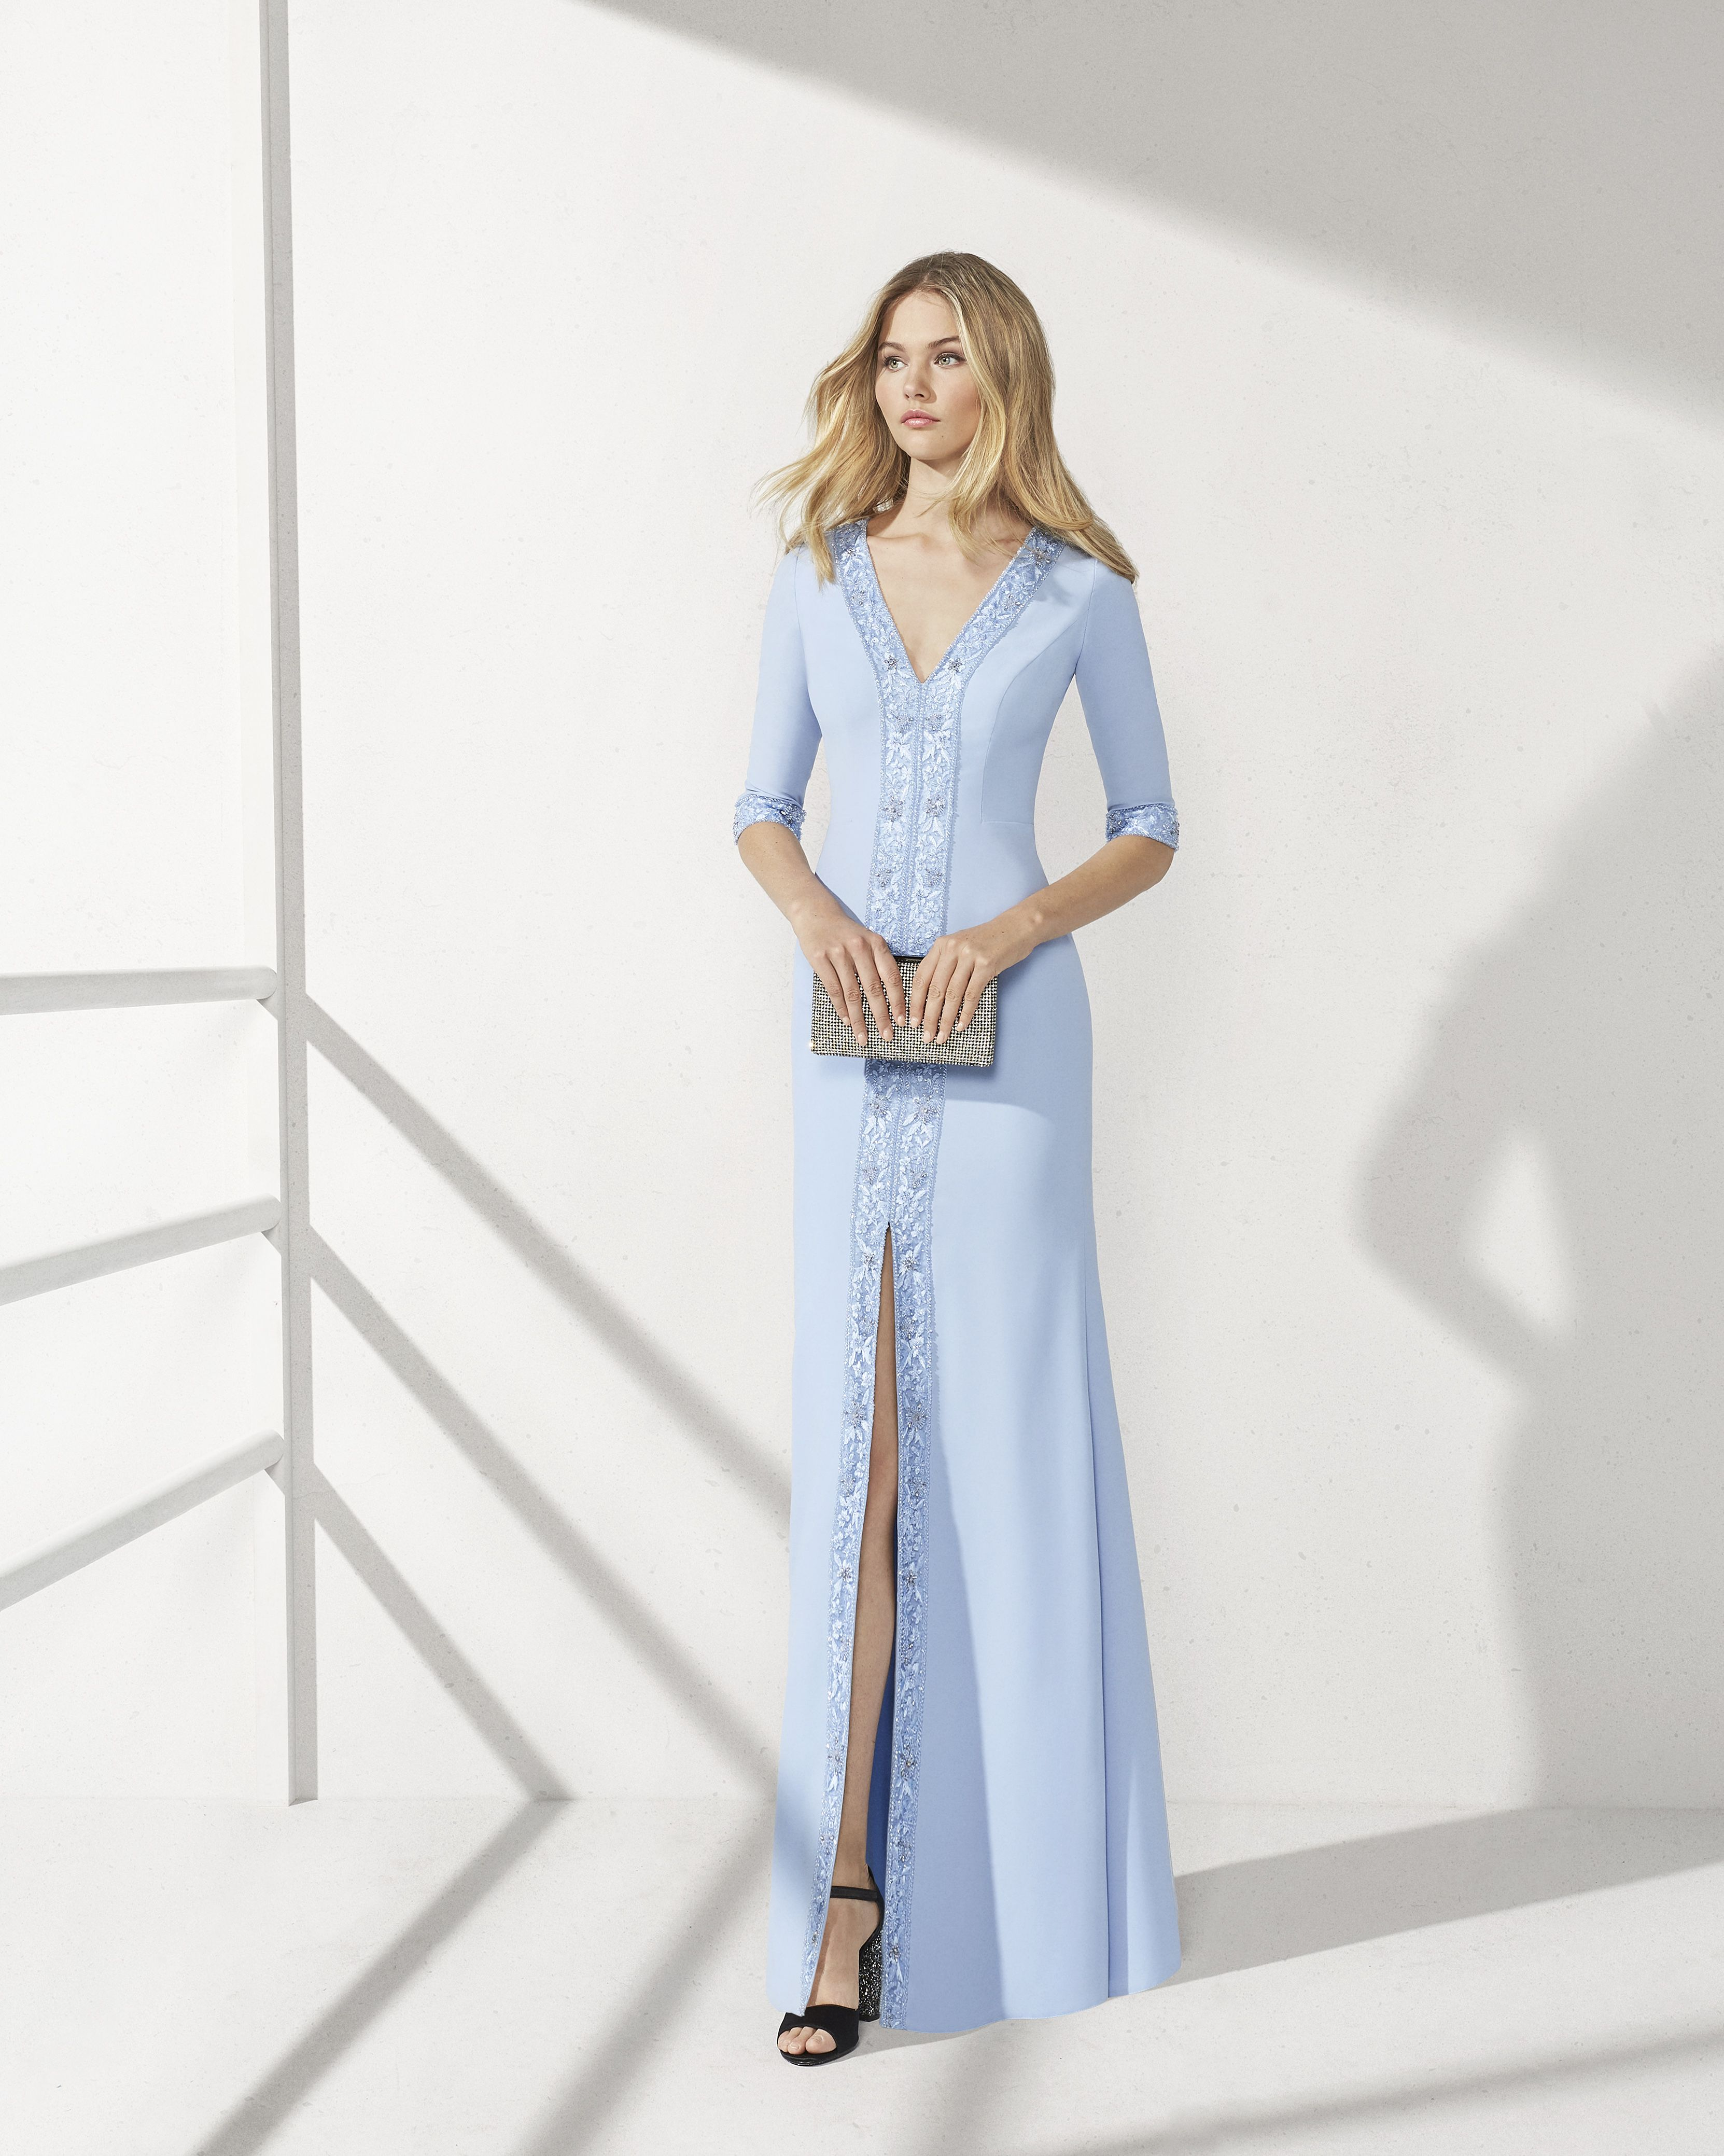 2ccbdb5e25 Beaded crepe cocktail dress. V-neckline and slit skirt. 2019 ROSA CLARA  COCKTAIL